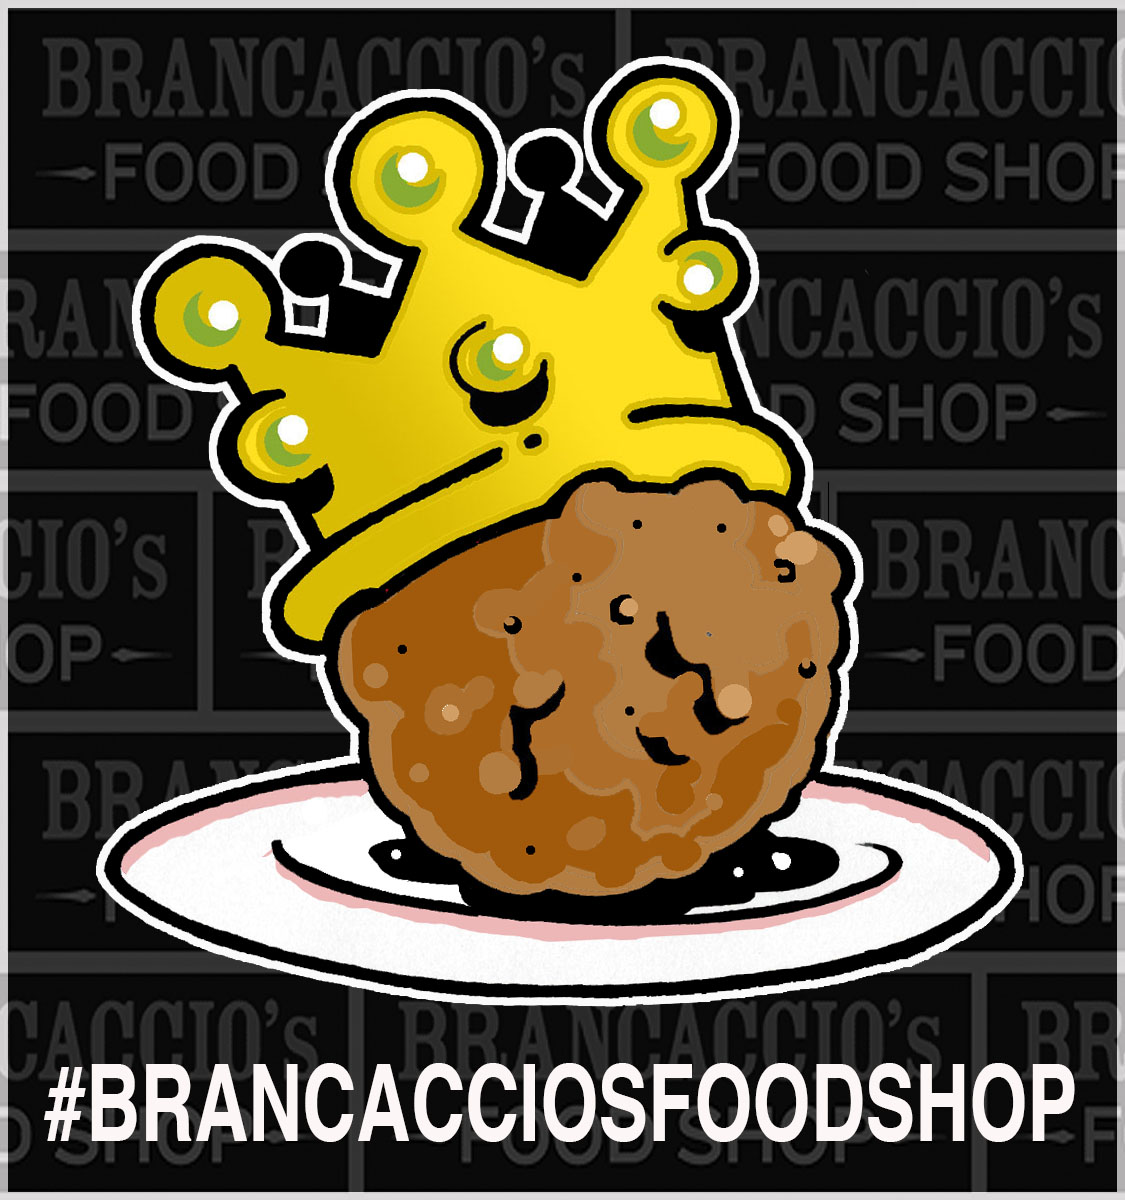 Brancacco's Food Shop Logo.jpg